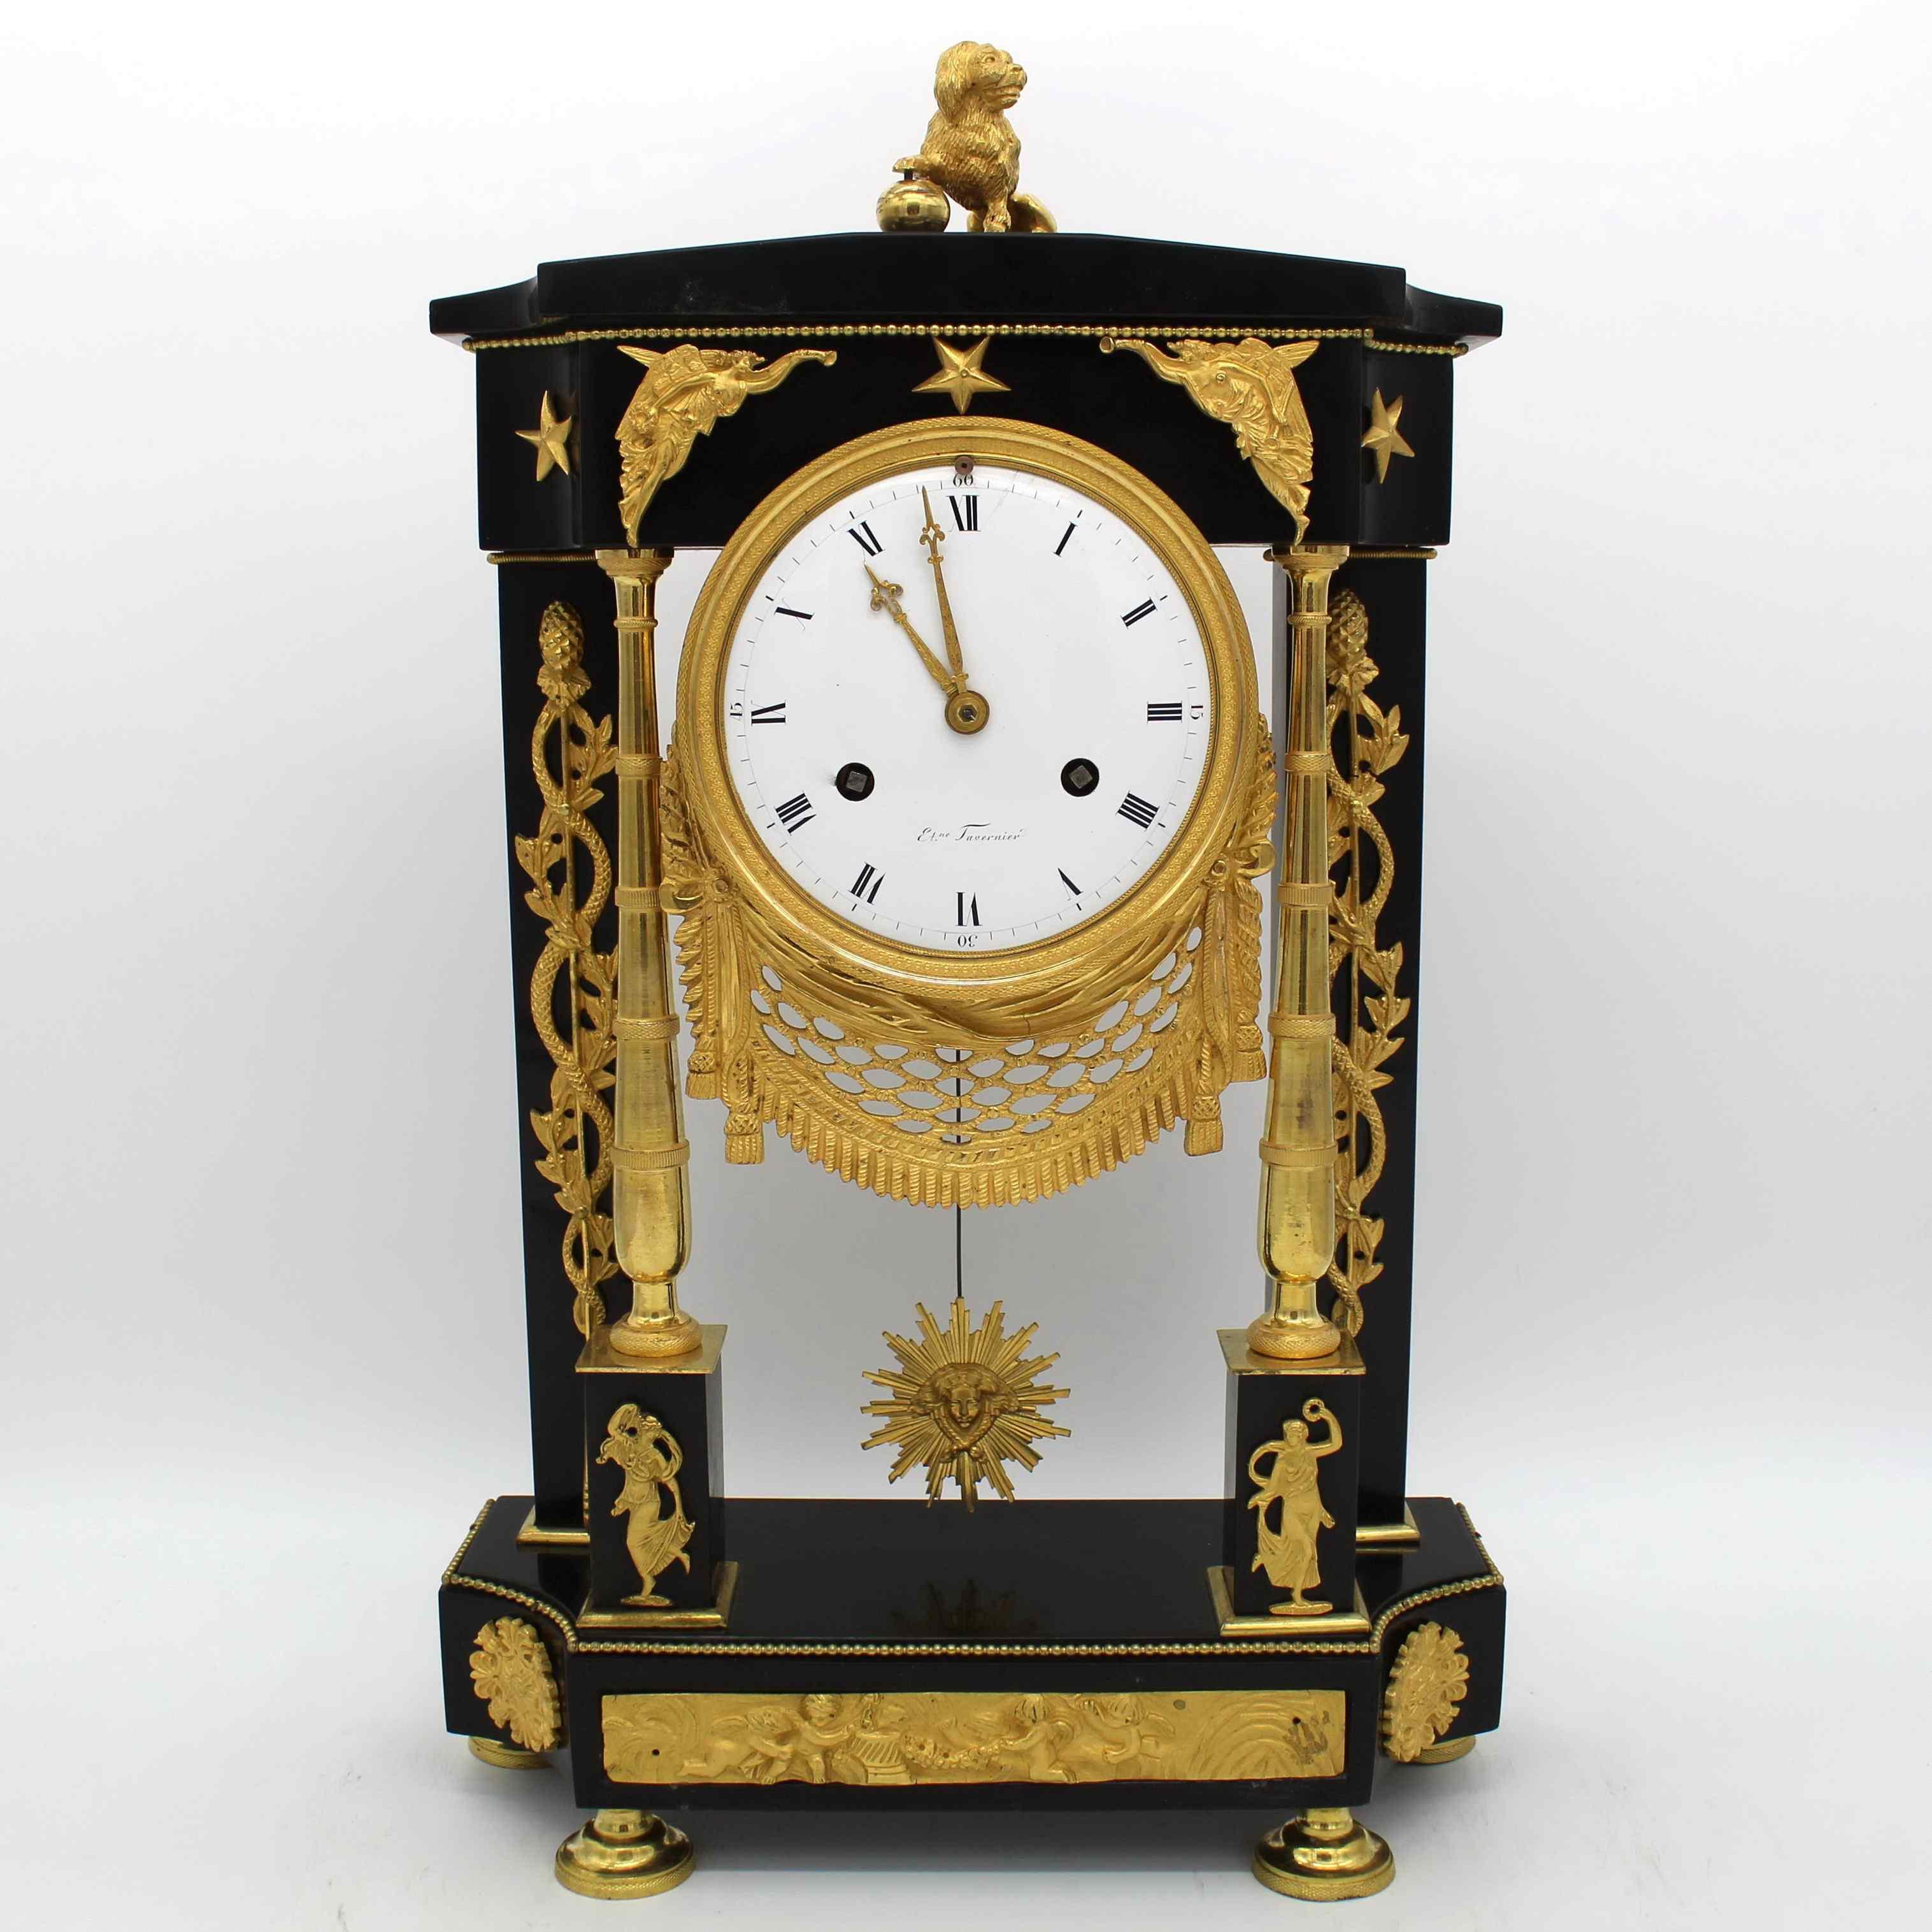 ancien horloge pendule empire en bronze et marbre 19 me anticswiss. Black Bedroom Furniture Sets. Home Design Ideas